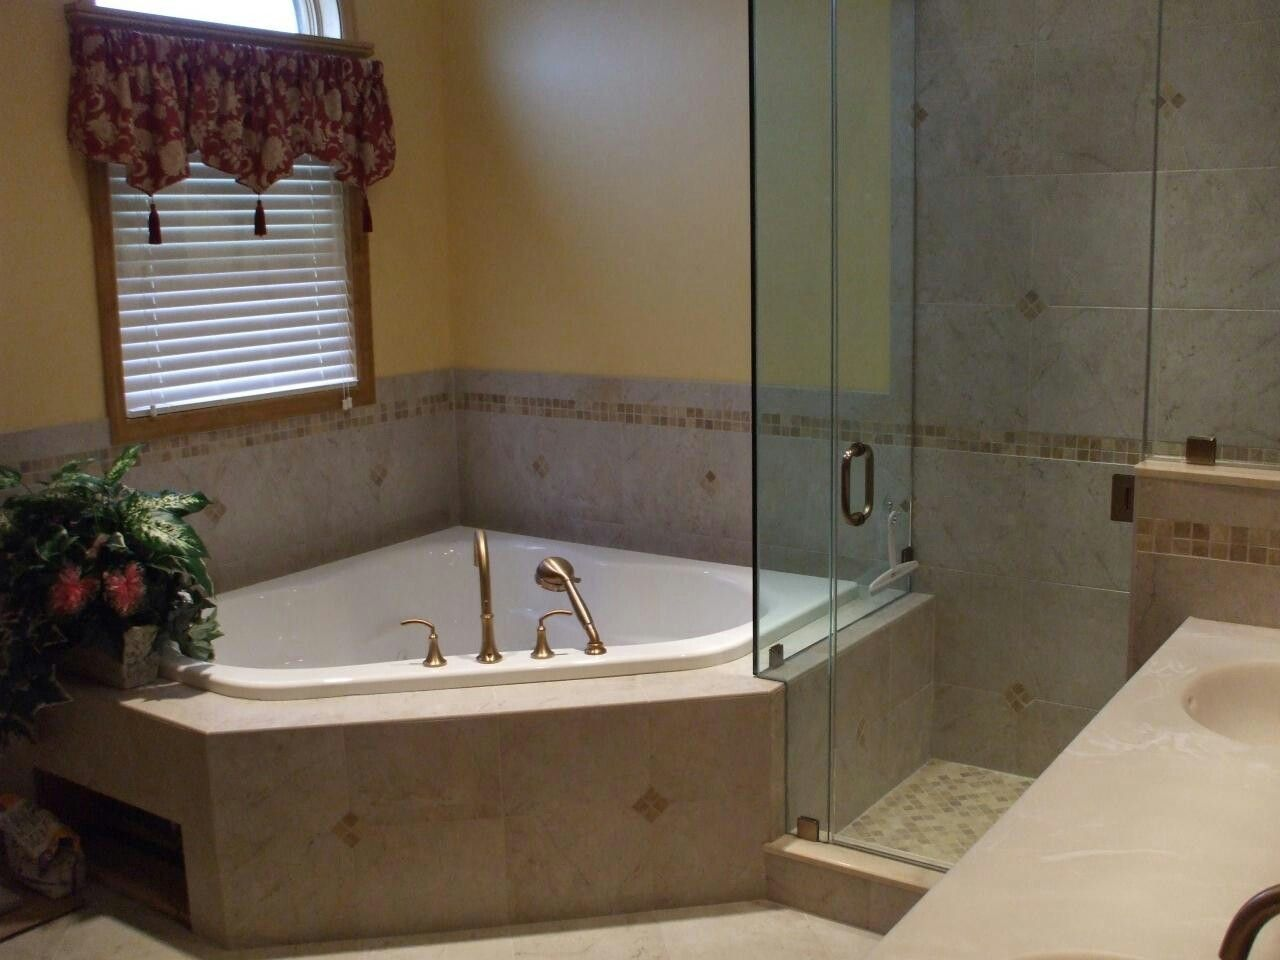 Angular Corner Bath And Shower Together Bathtub Shower Combo Corner Bathtub Shower Corner Tub Shower